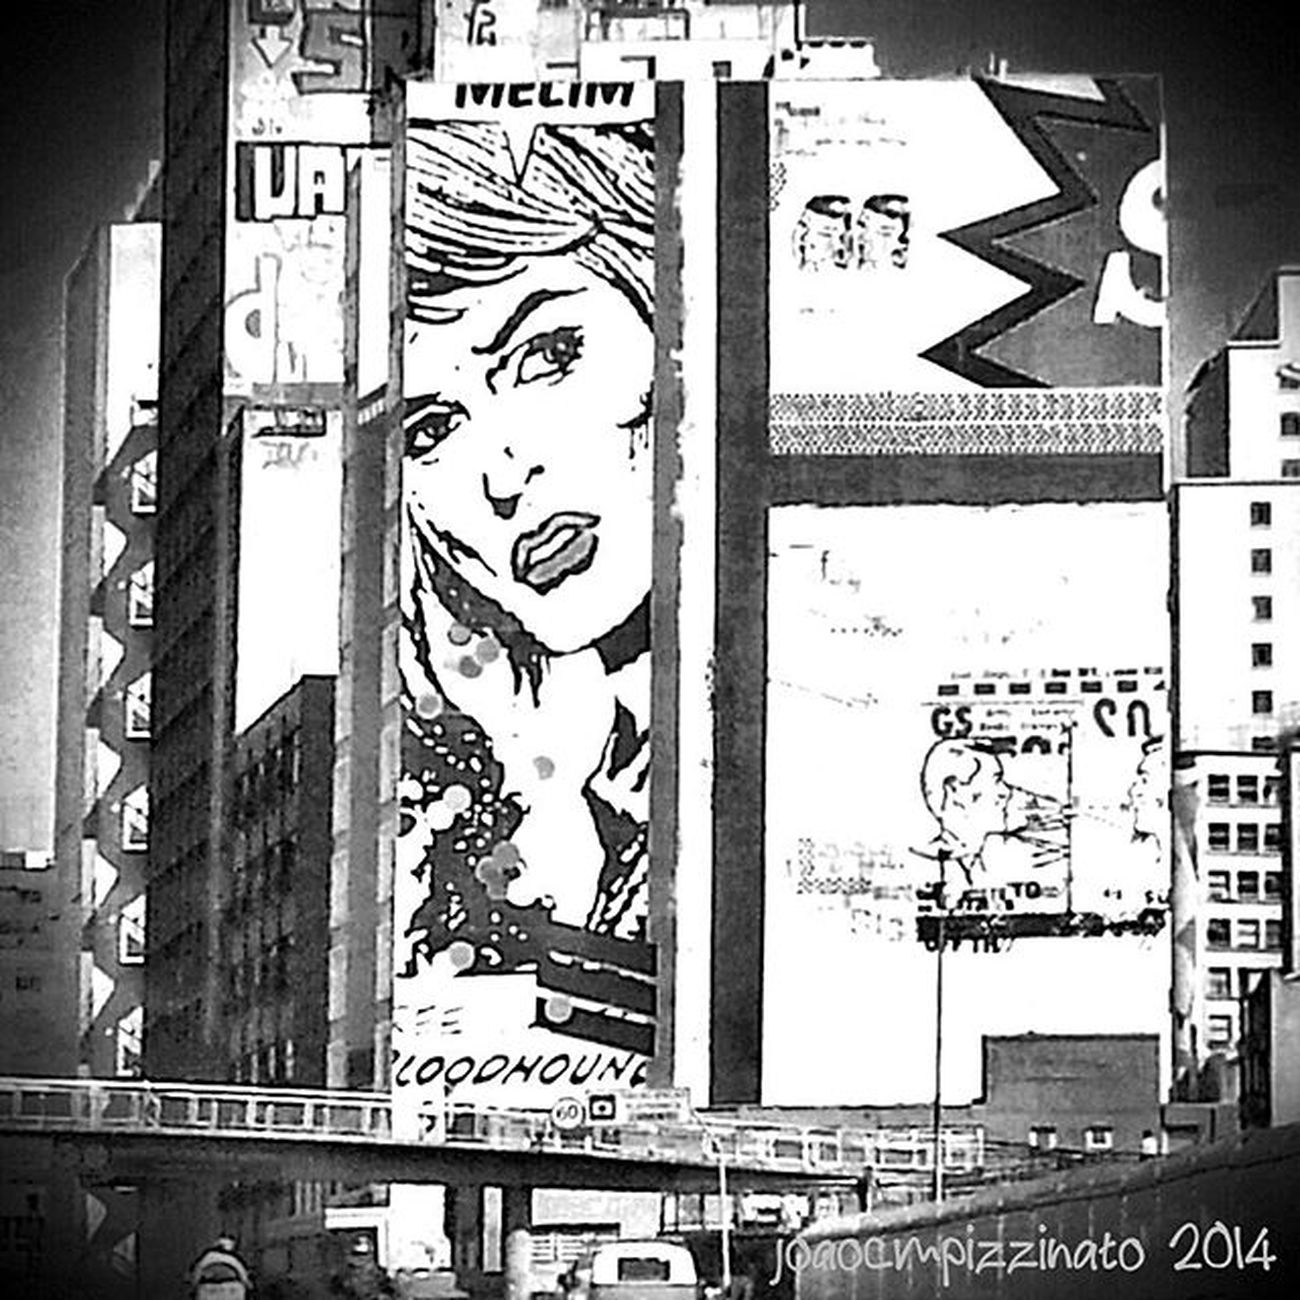 Graffiti Graffitiart Art Streetart UrbanART Streetphotography Streetphoto_brasil Foto_blackwhite Ig_contrast_bnw Amateurs_bnw Bnwmood Bnw_kings Bnw_planet Bnw_captures Top_bnw Paulistanobw Bnw_lombardia Instapicten Top_bnw_photo Bnw_life_shots Urbexbrasil Urbexsp Jj_urbex Mundoruasp Olhonaruasp flaming_abstracts